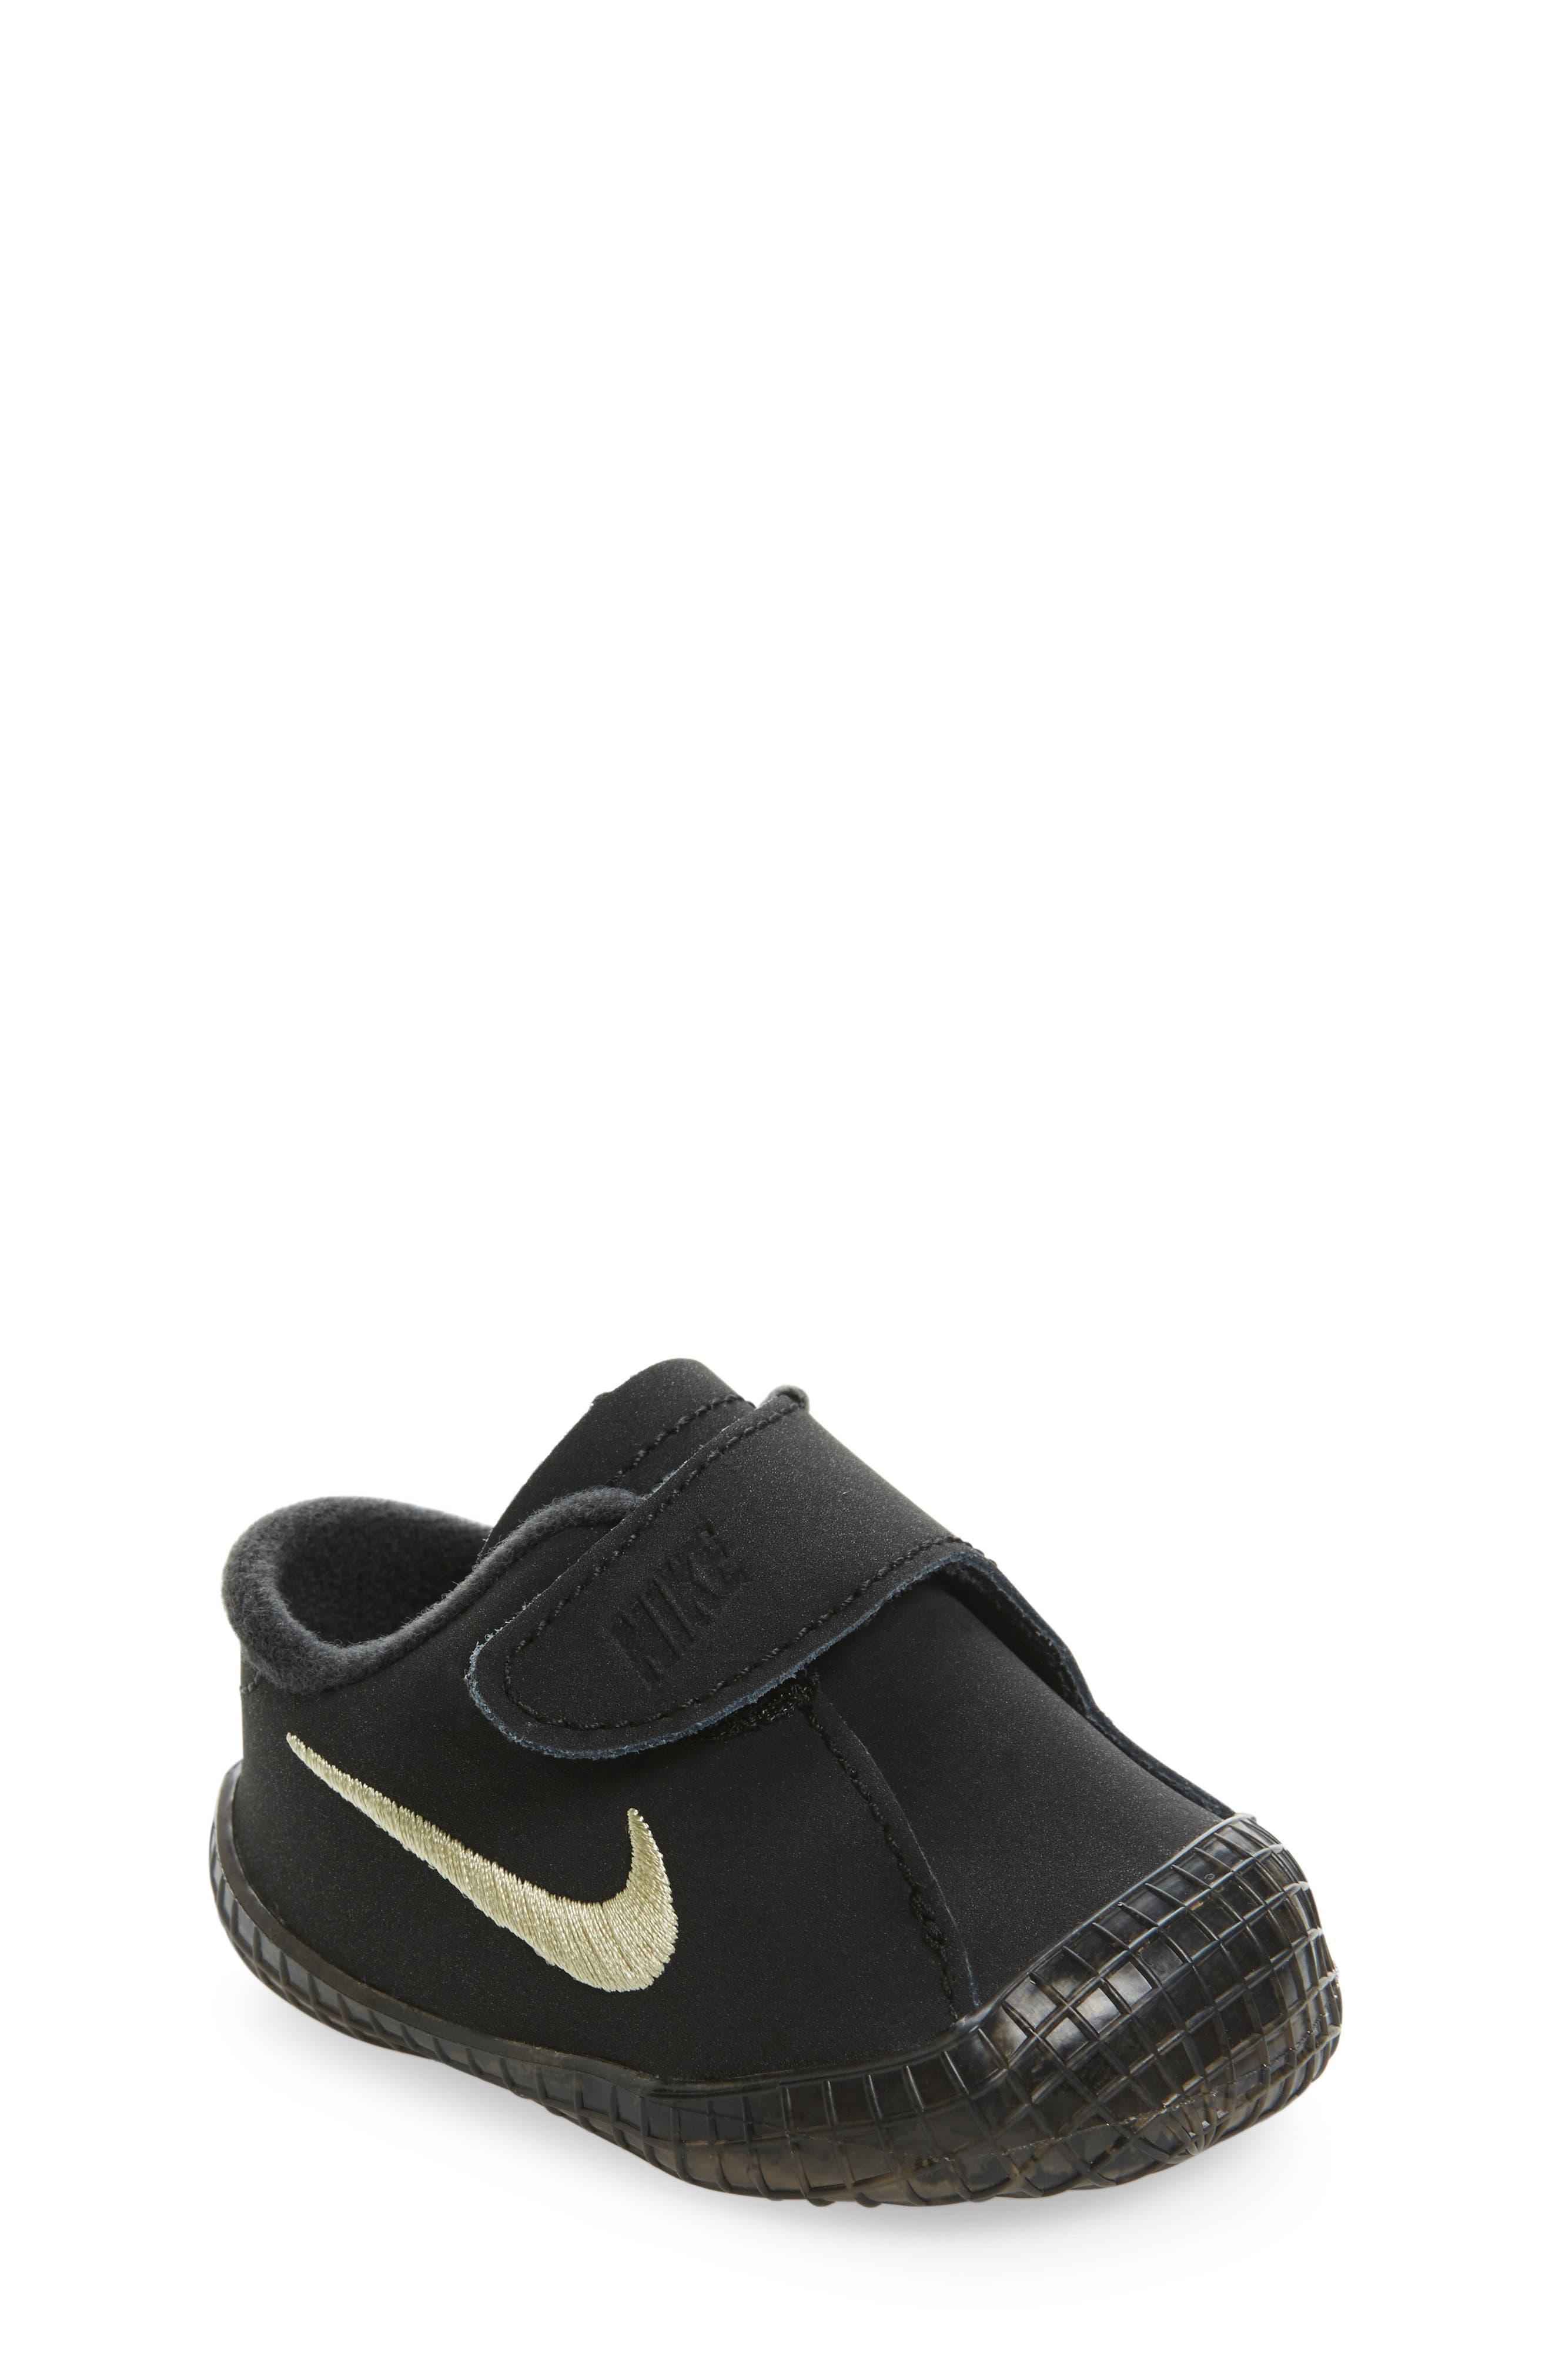 Nike 'Waffle 1' Suede Crib Shoe (Baby)